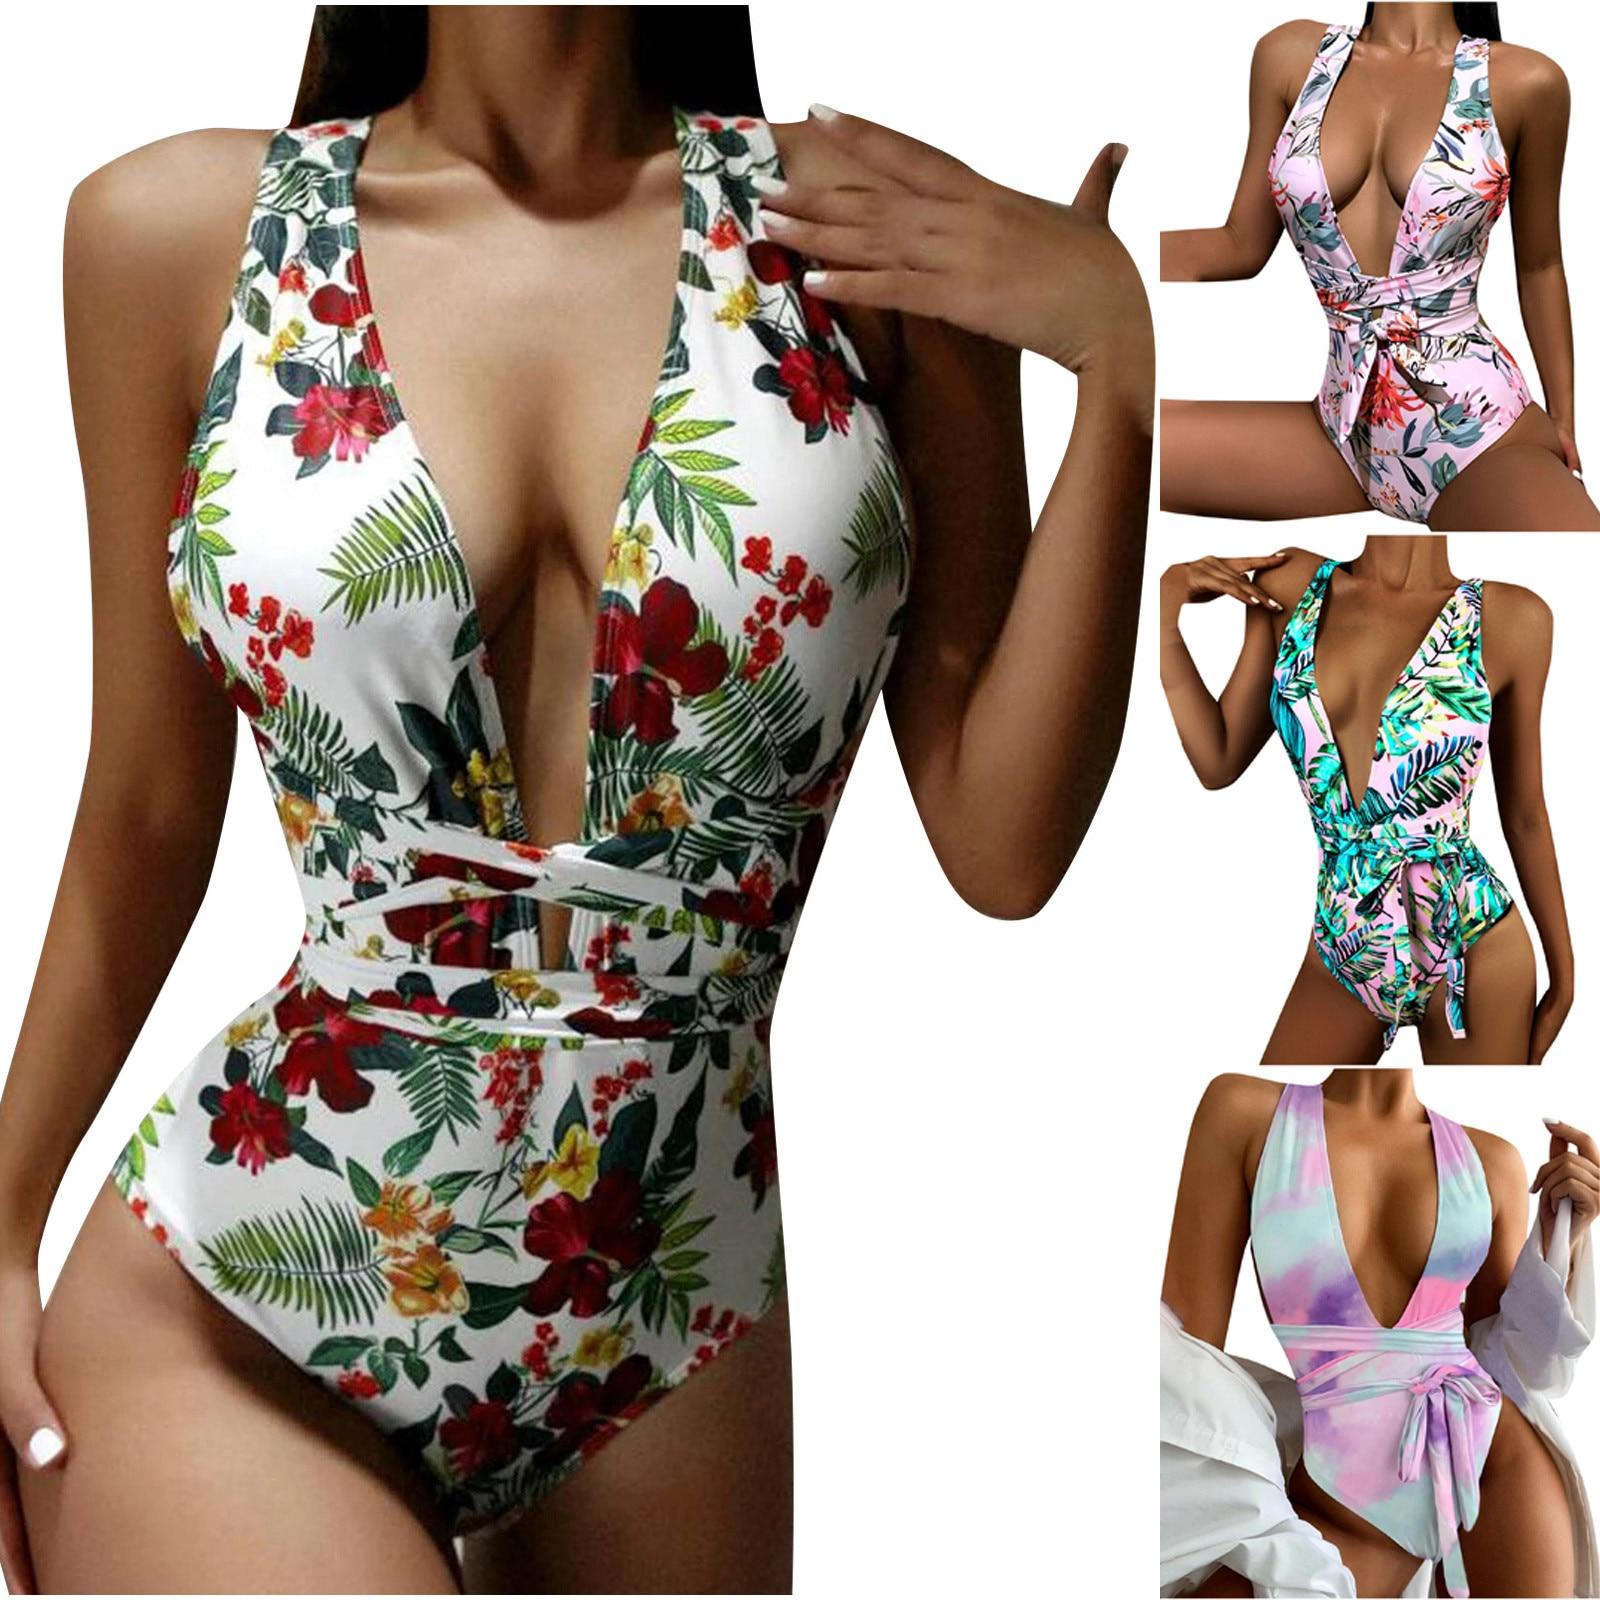 Fashion One Piece Swimsuit Women Swimwear V-Neck Printing Bandage  Siamese Swimsuit Bikini Swimming Suits bañadores mujer 2021